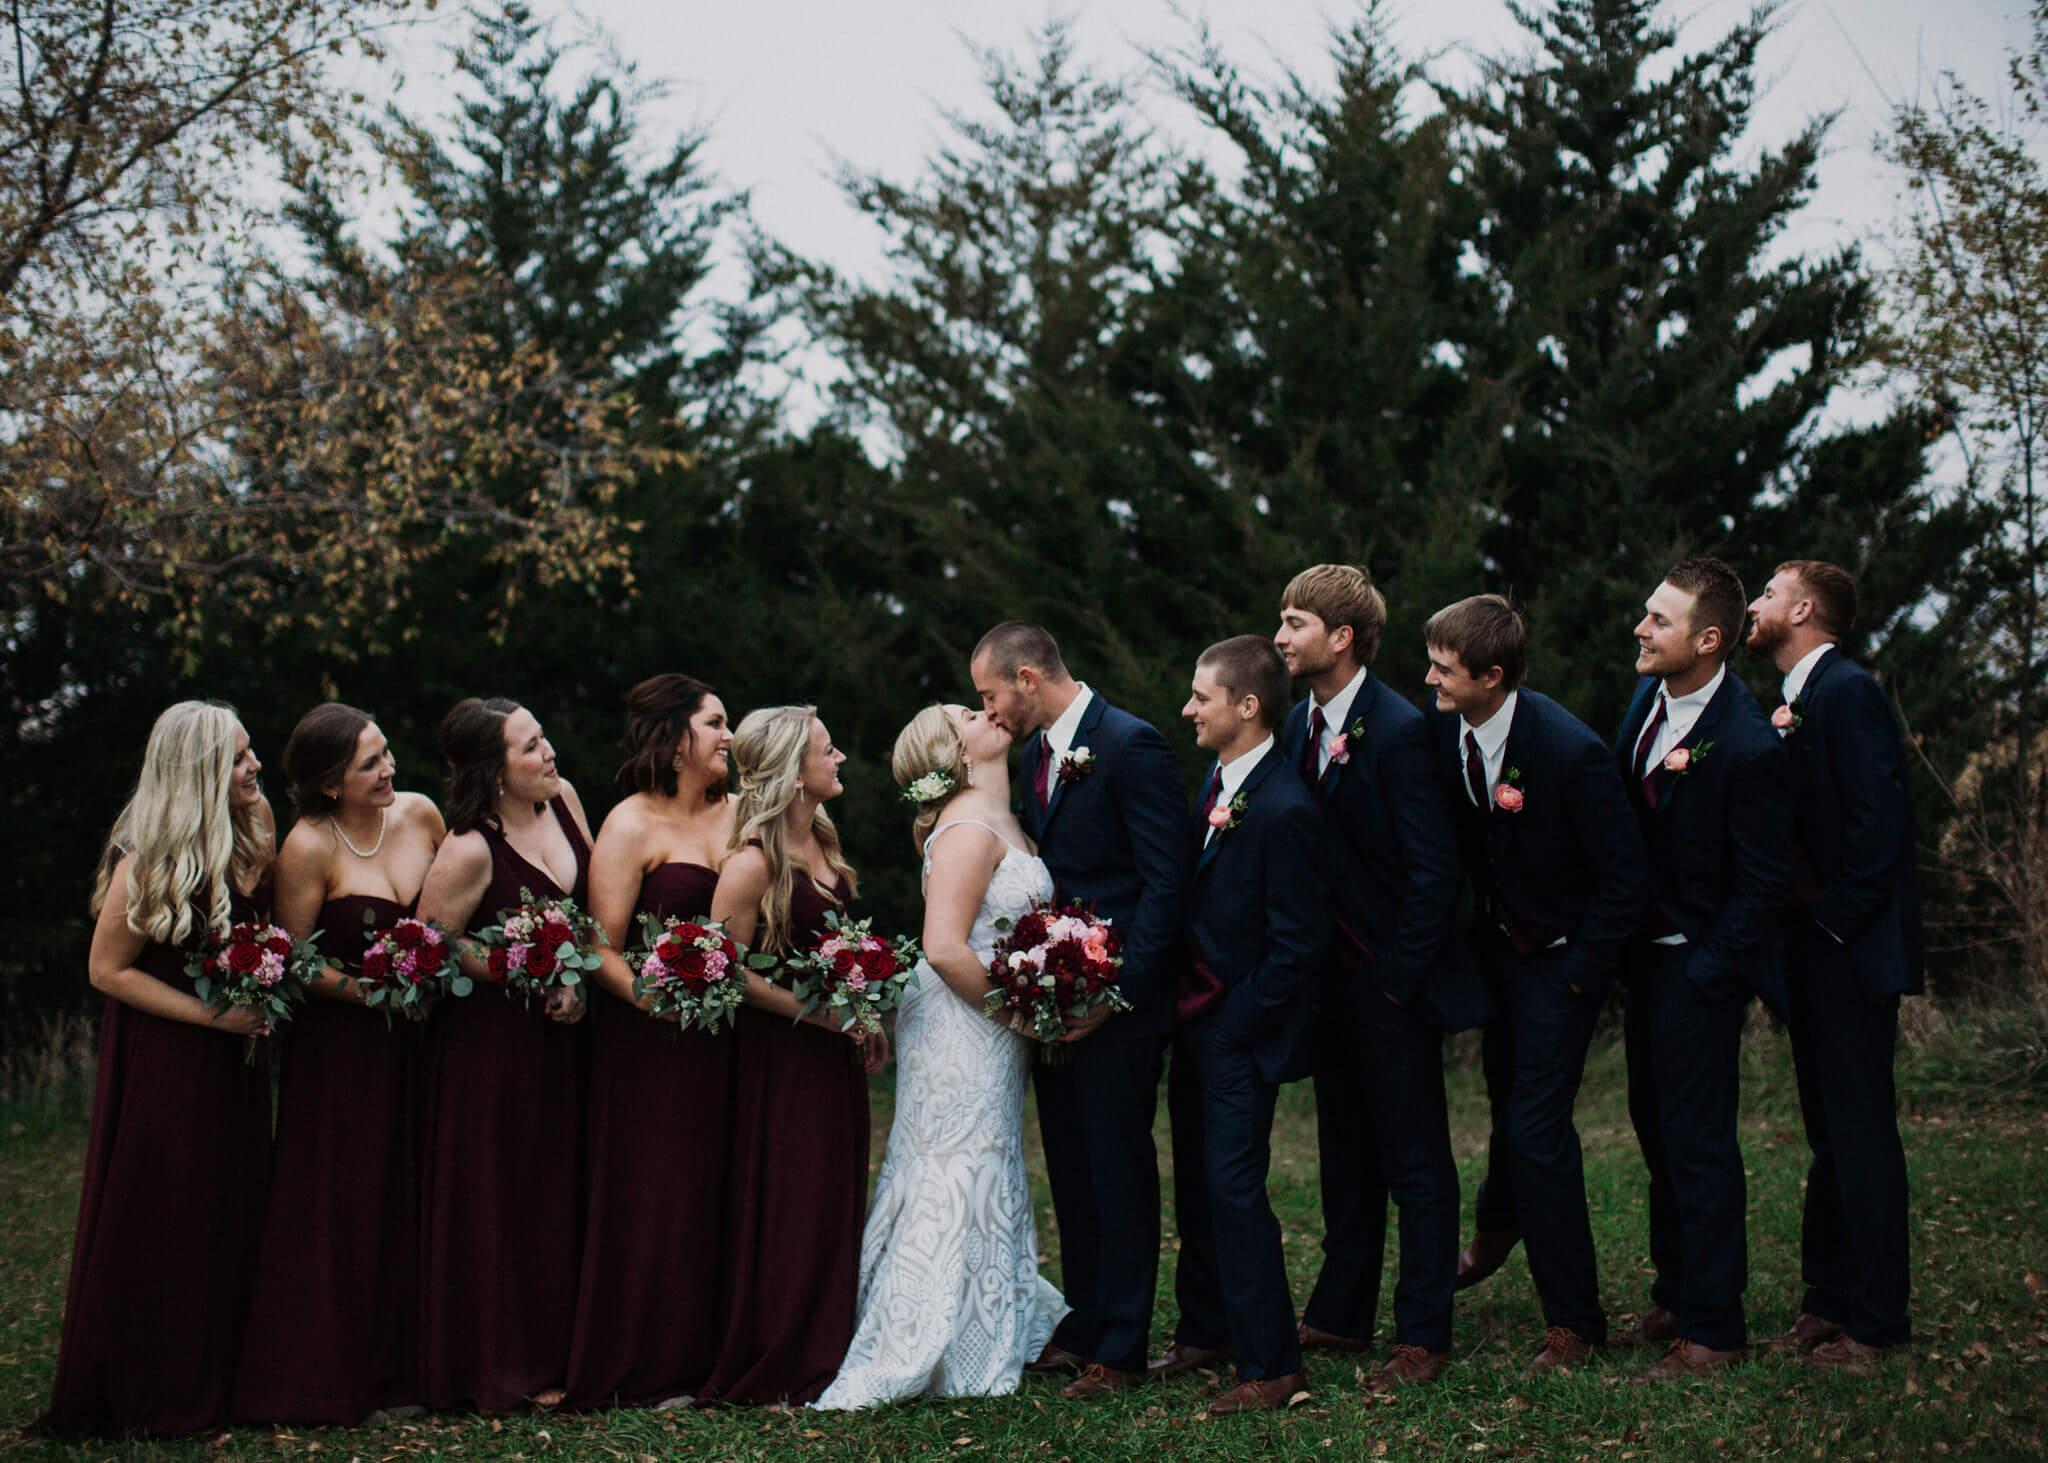 Wedding Party Roca Ridge Events Dana Osborne Design